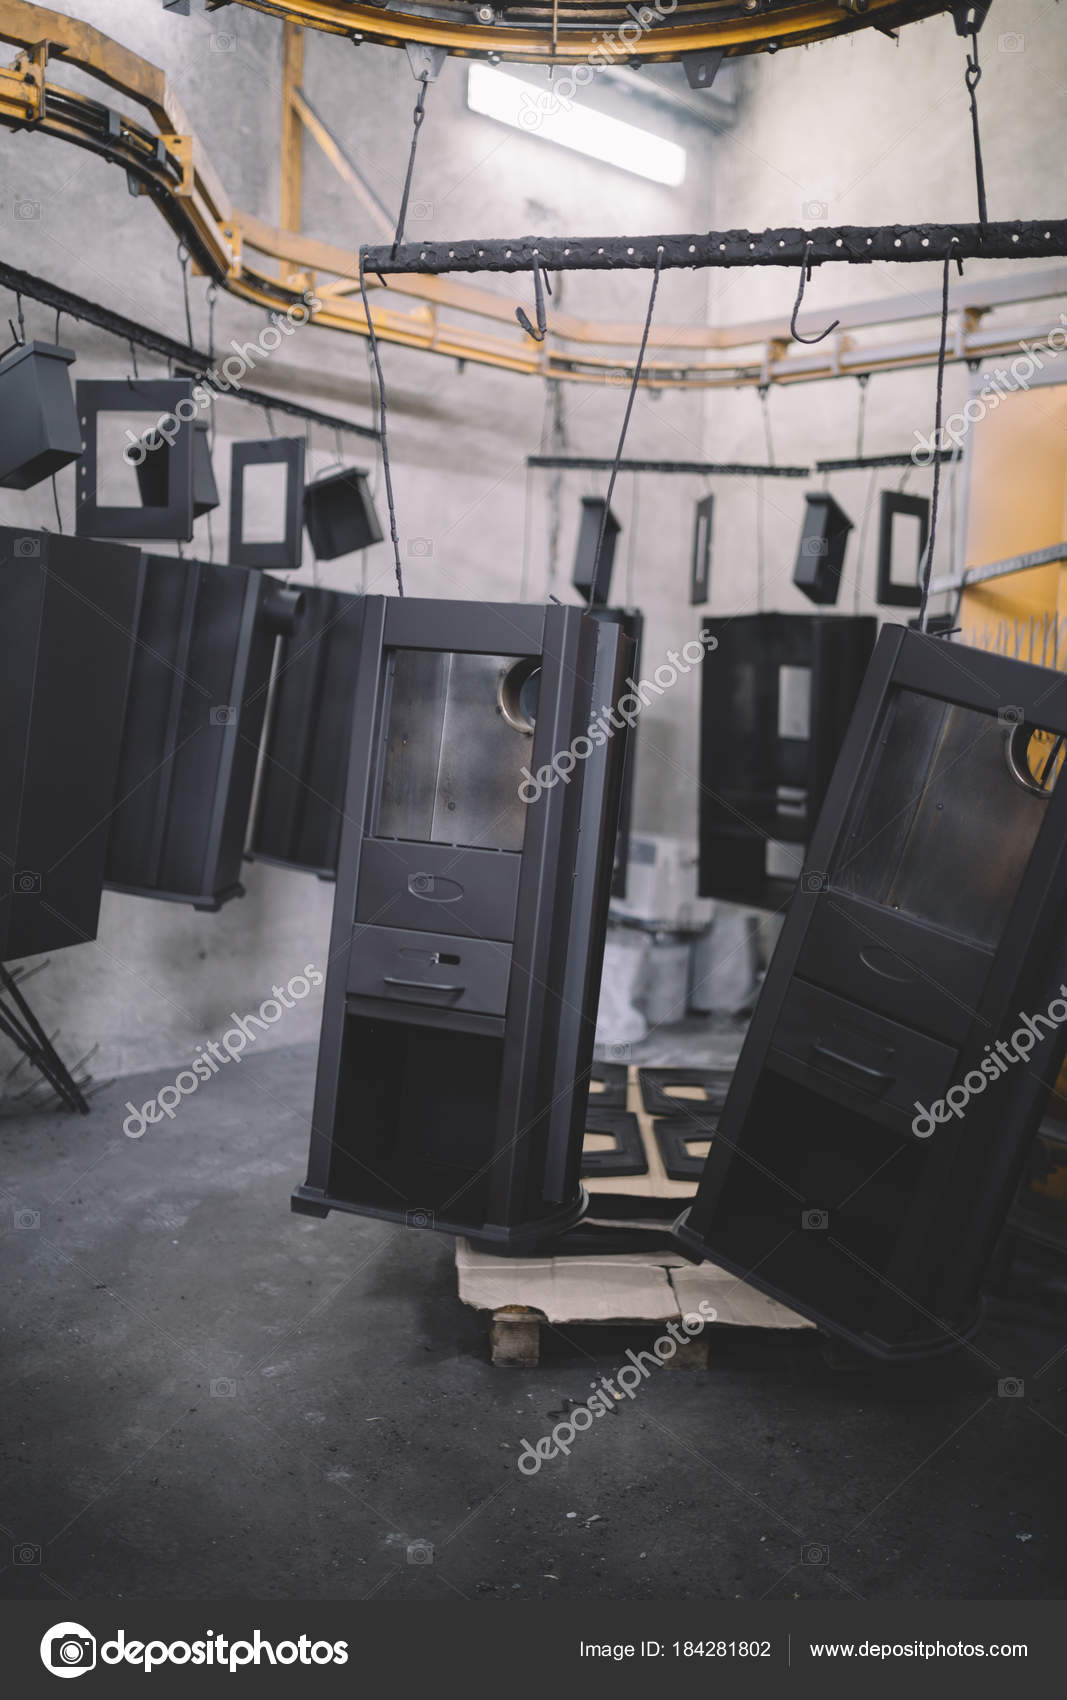 https://st3.depositphotos.com/9378882/18428/i/1600/depositphotos_184281802-stock-photo-metallurgy-industry-interior-details-factory.jpg